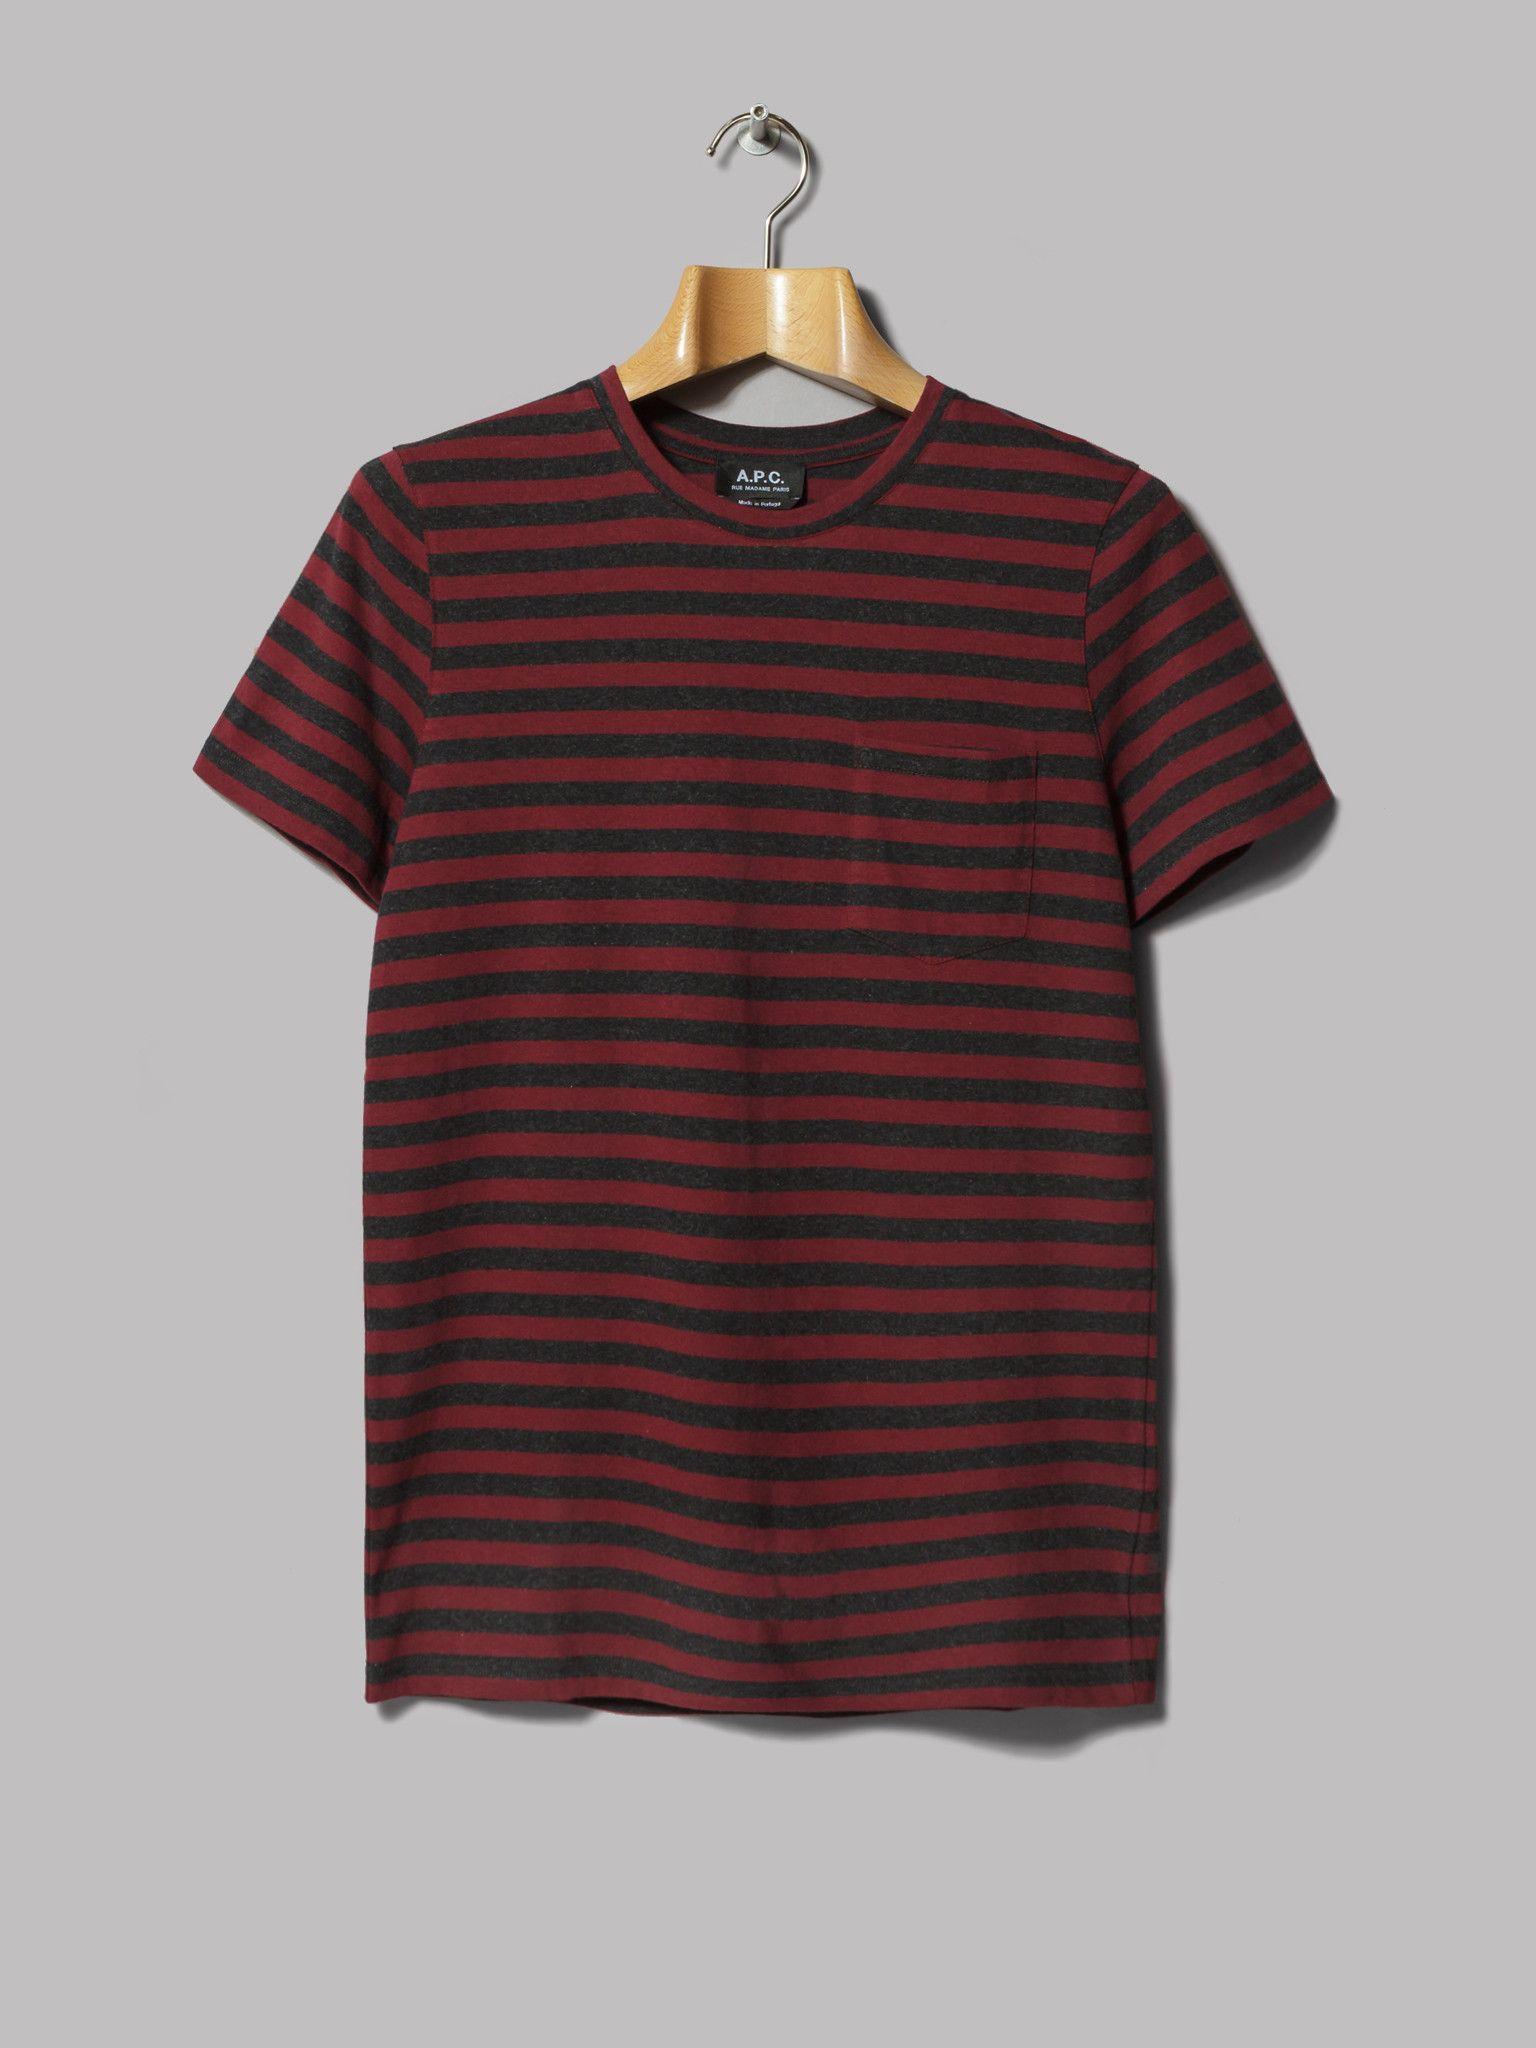 9ec3722d1ee4 A.P.C. T-Shirt Keanu (Anthracite)